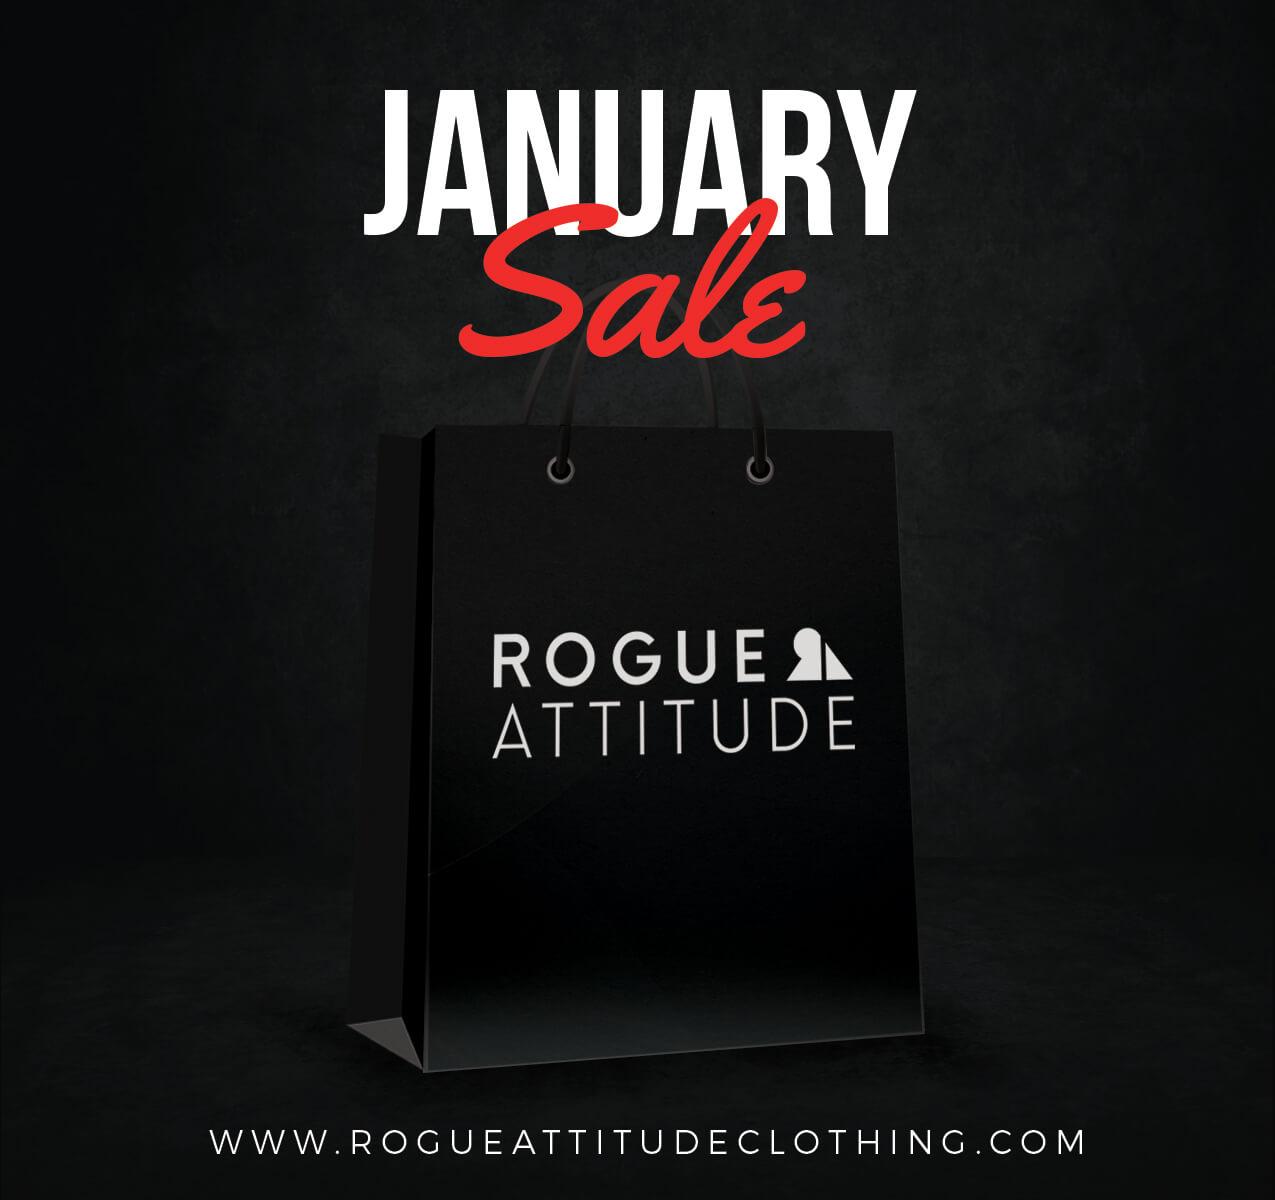 JanuarySaleRogue